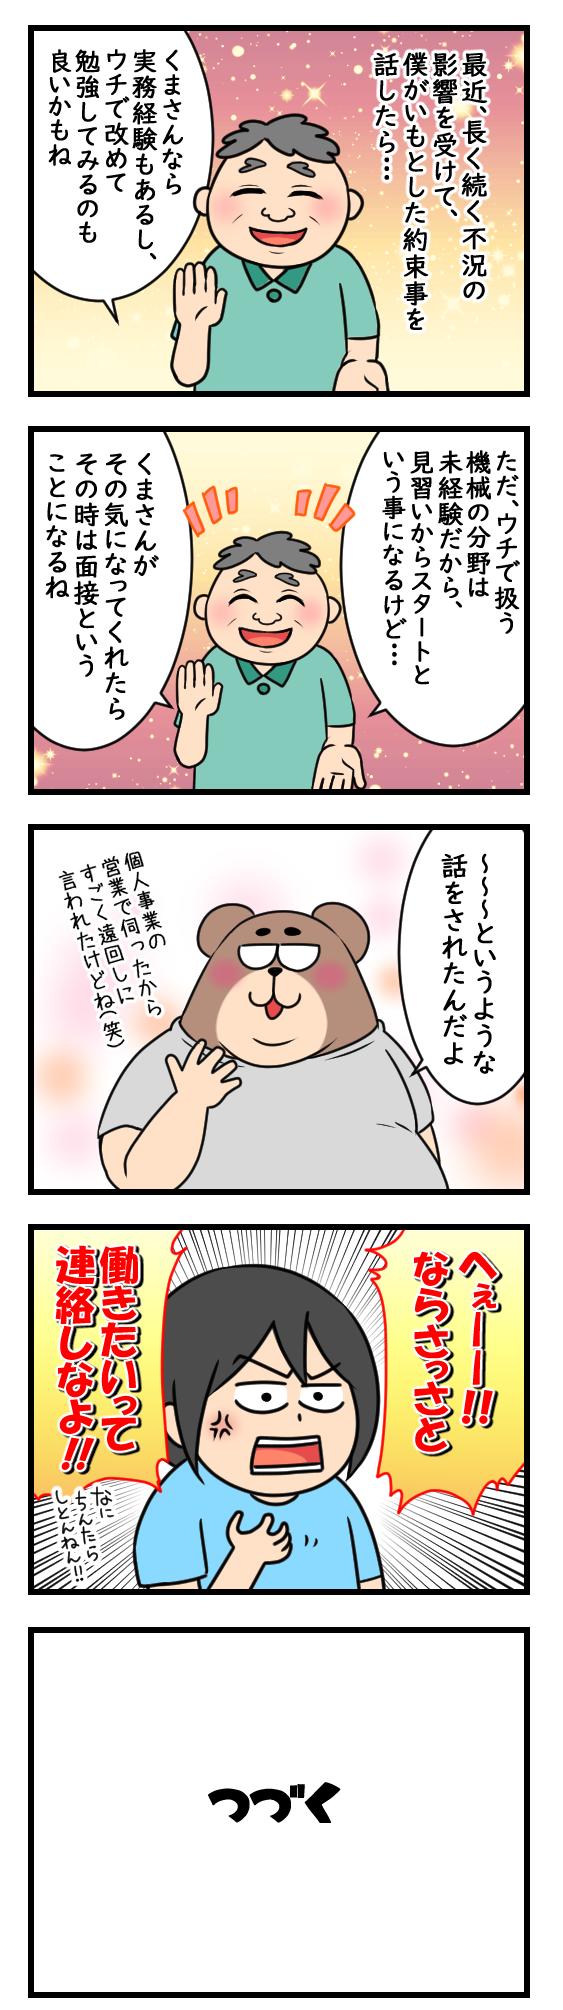 006_2